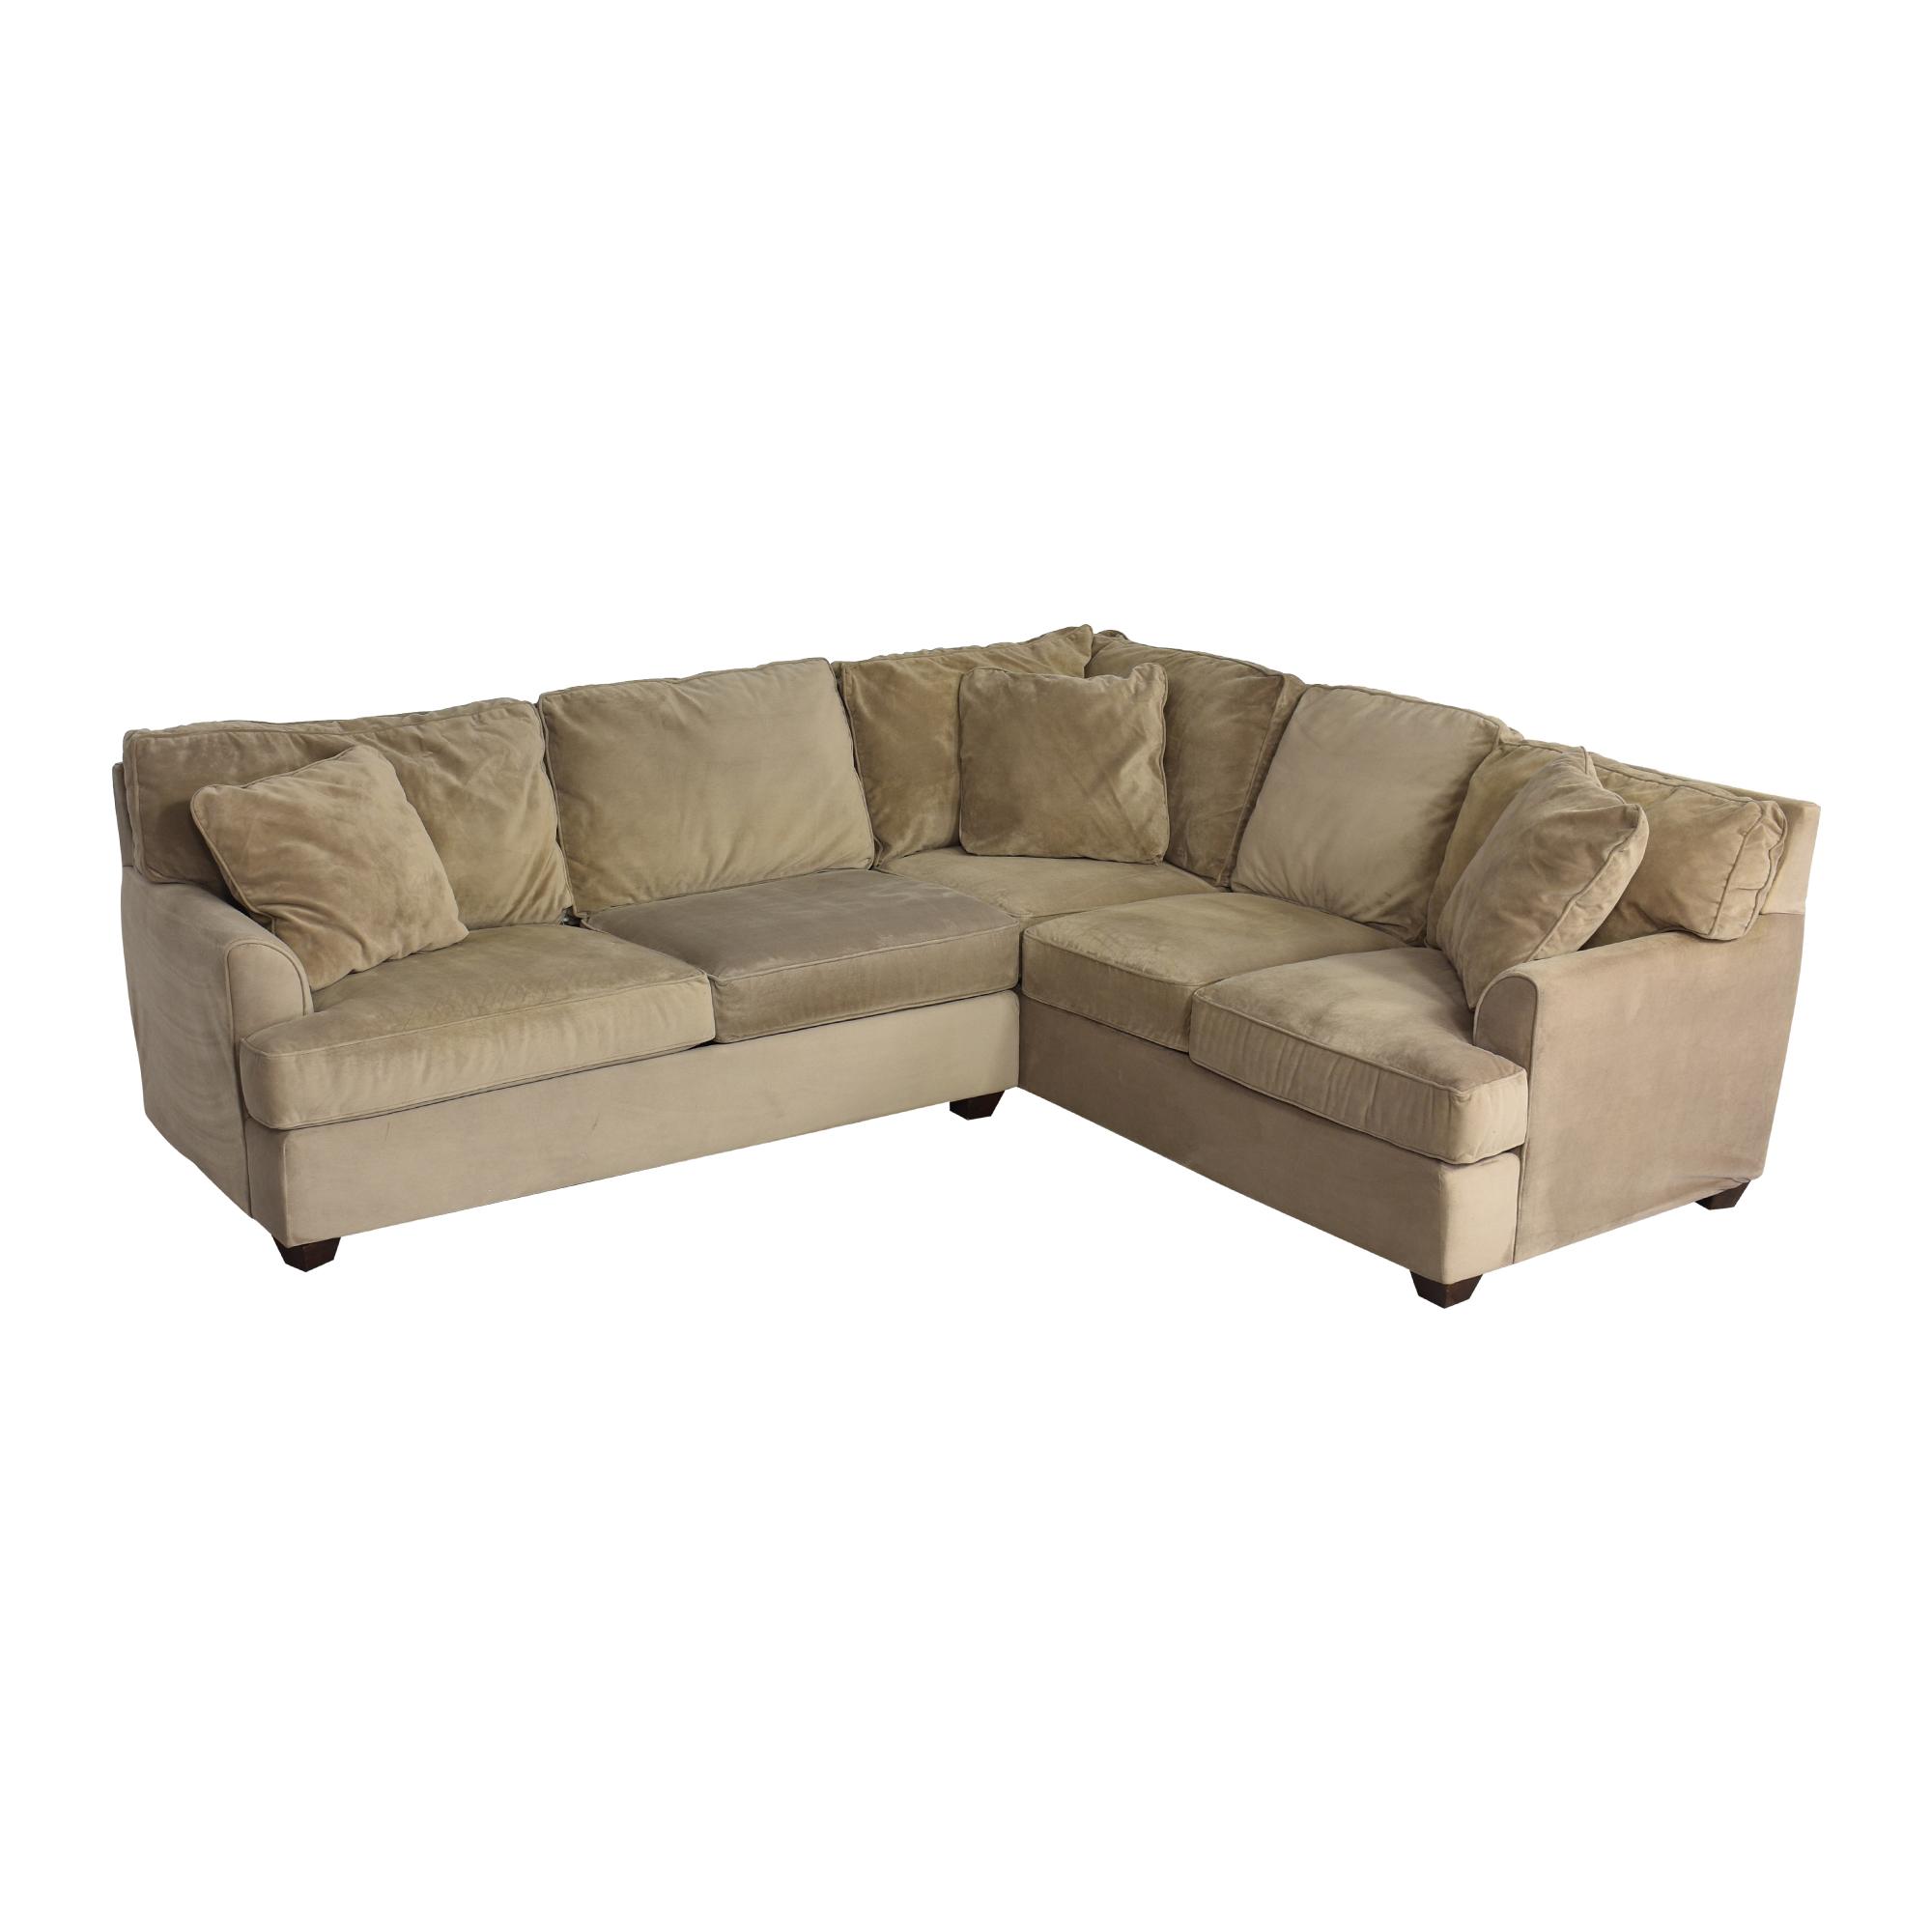 JC Penney Corner Sectional Sofa / Sofas